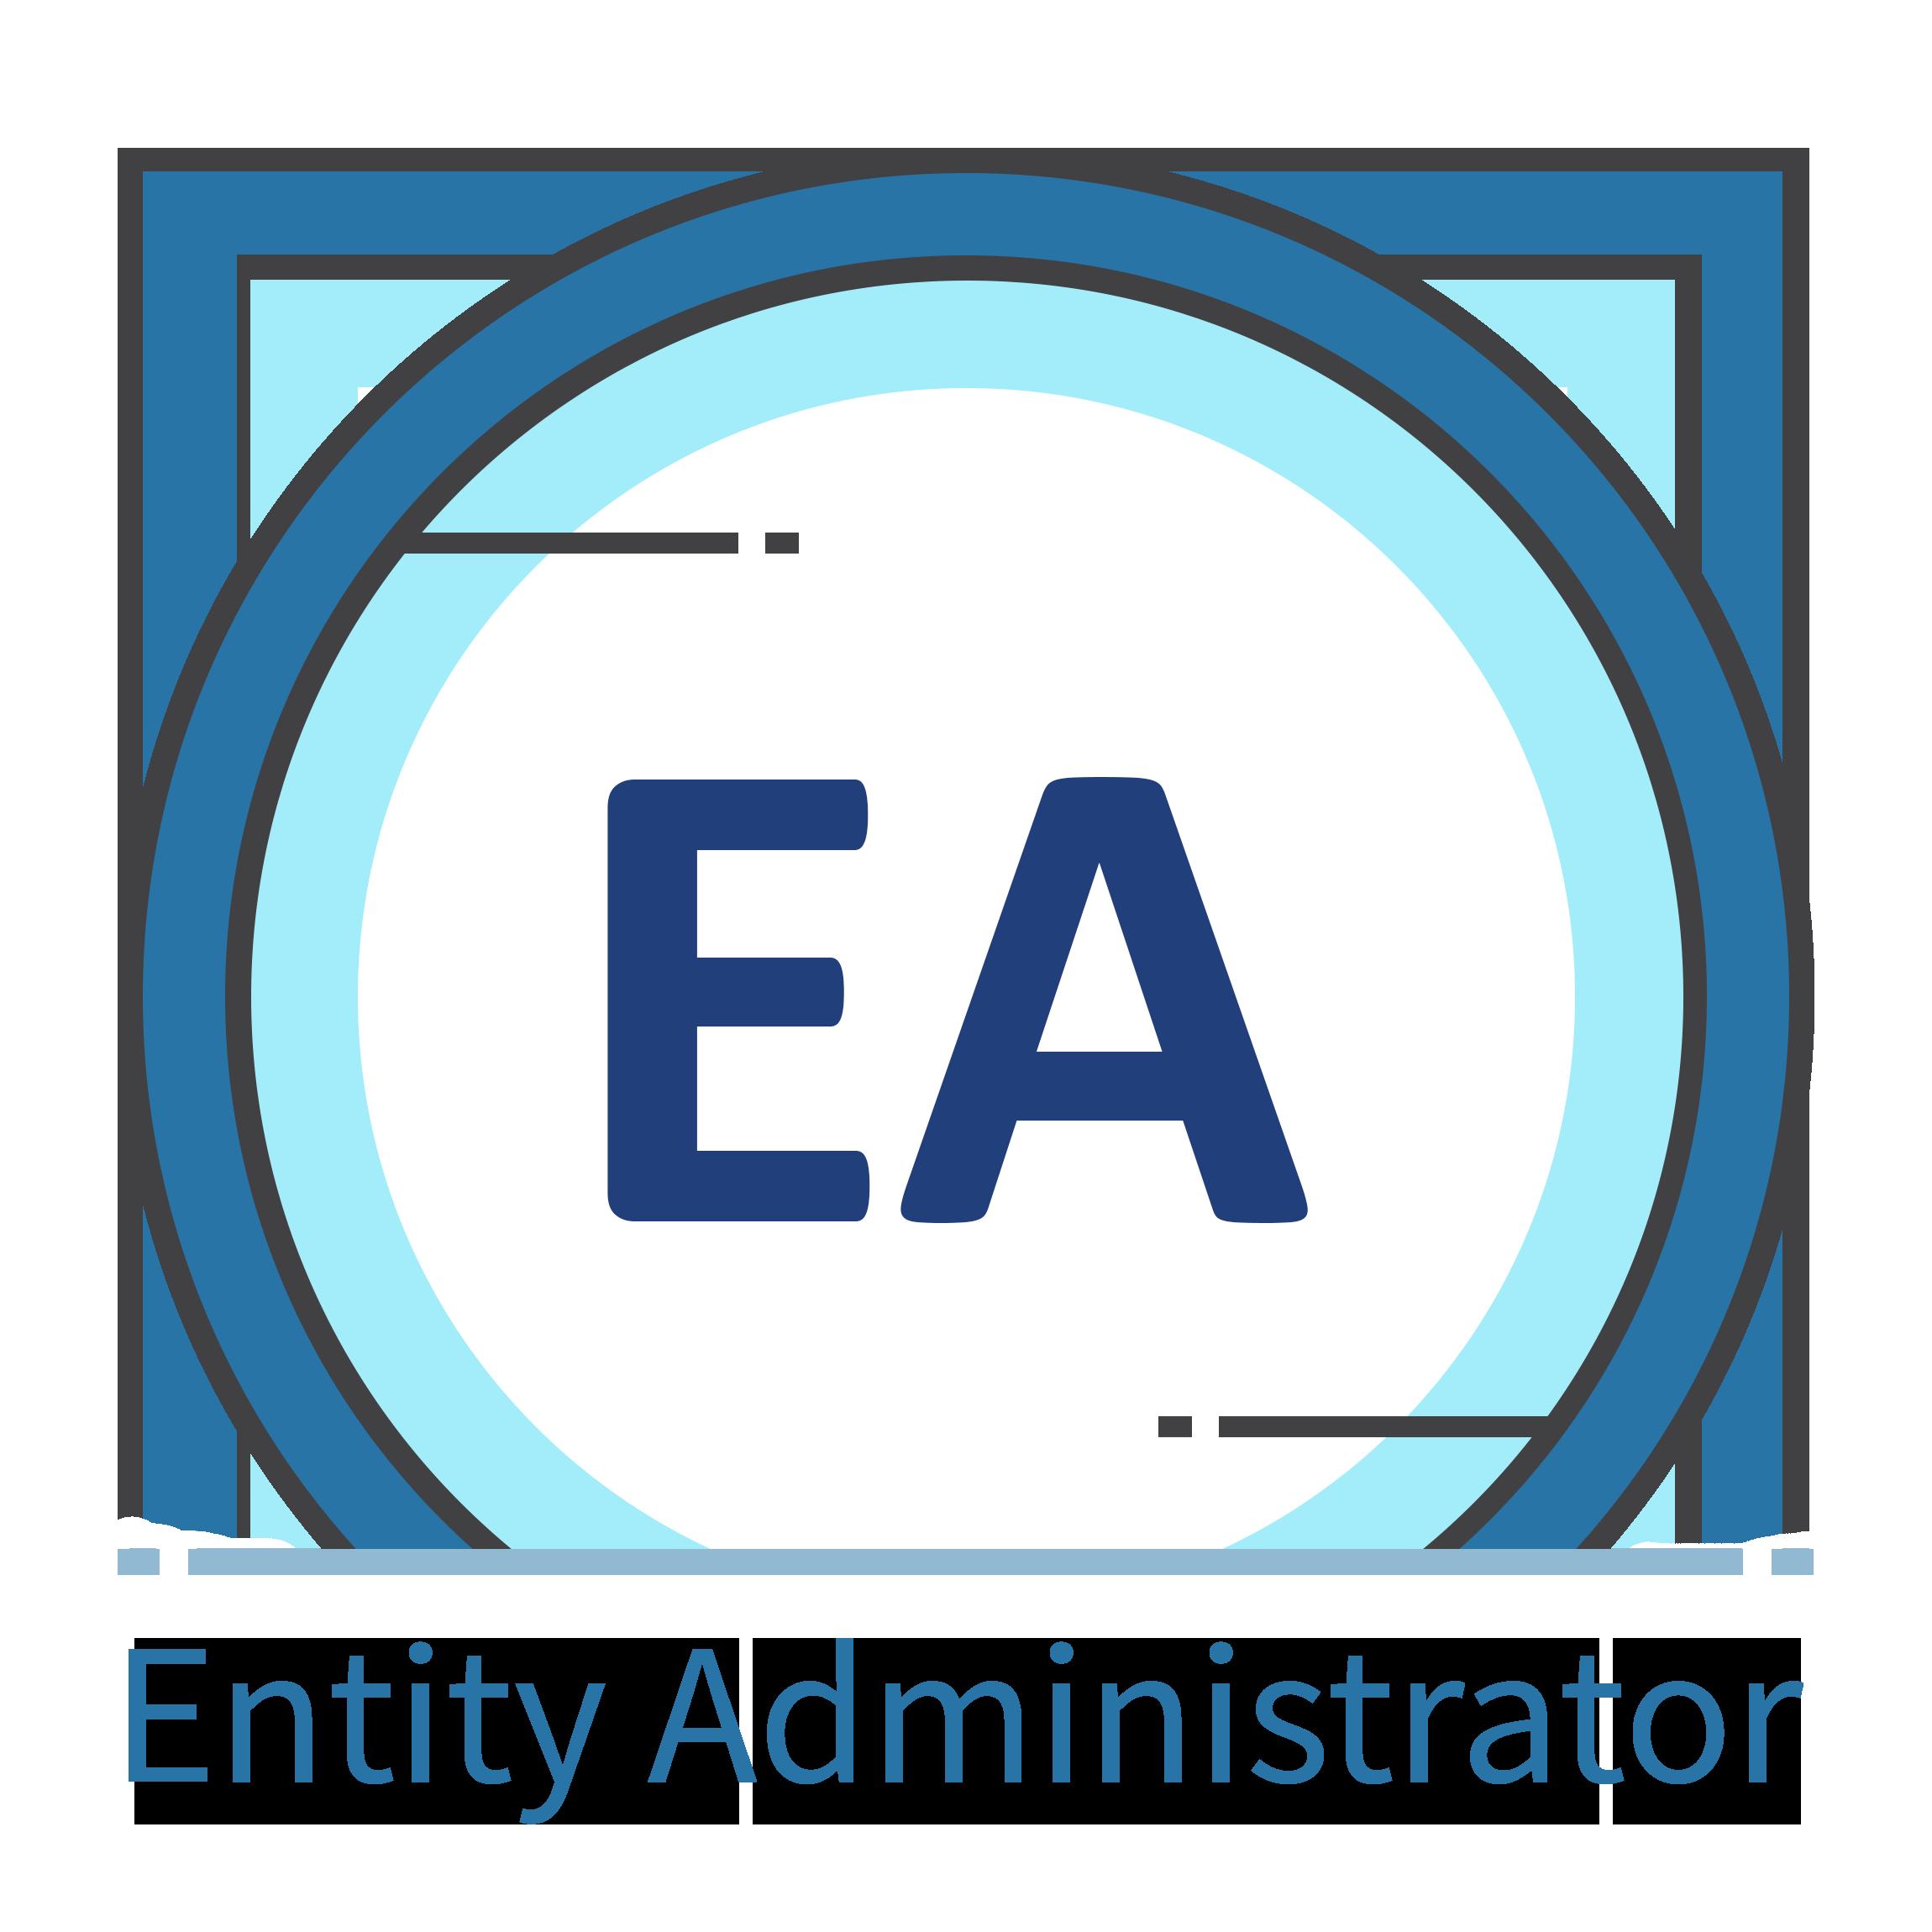 Entity Administrator Fundamentals